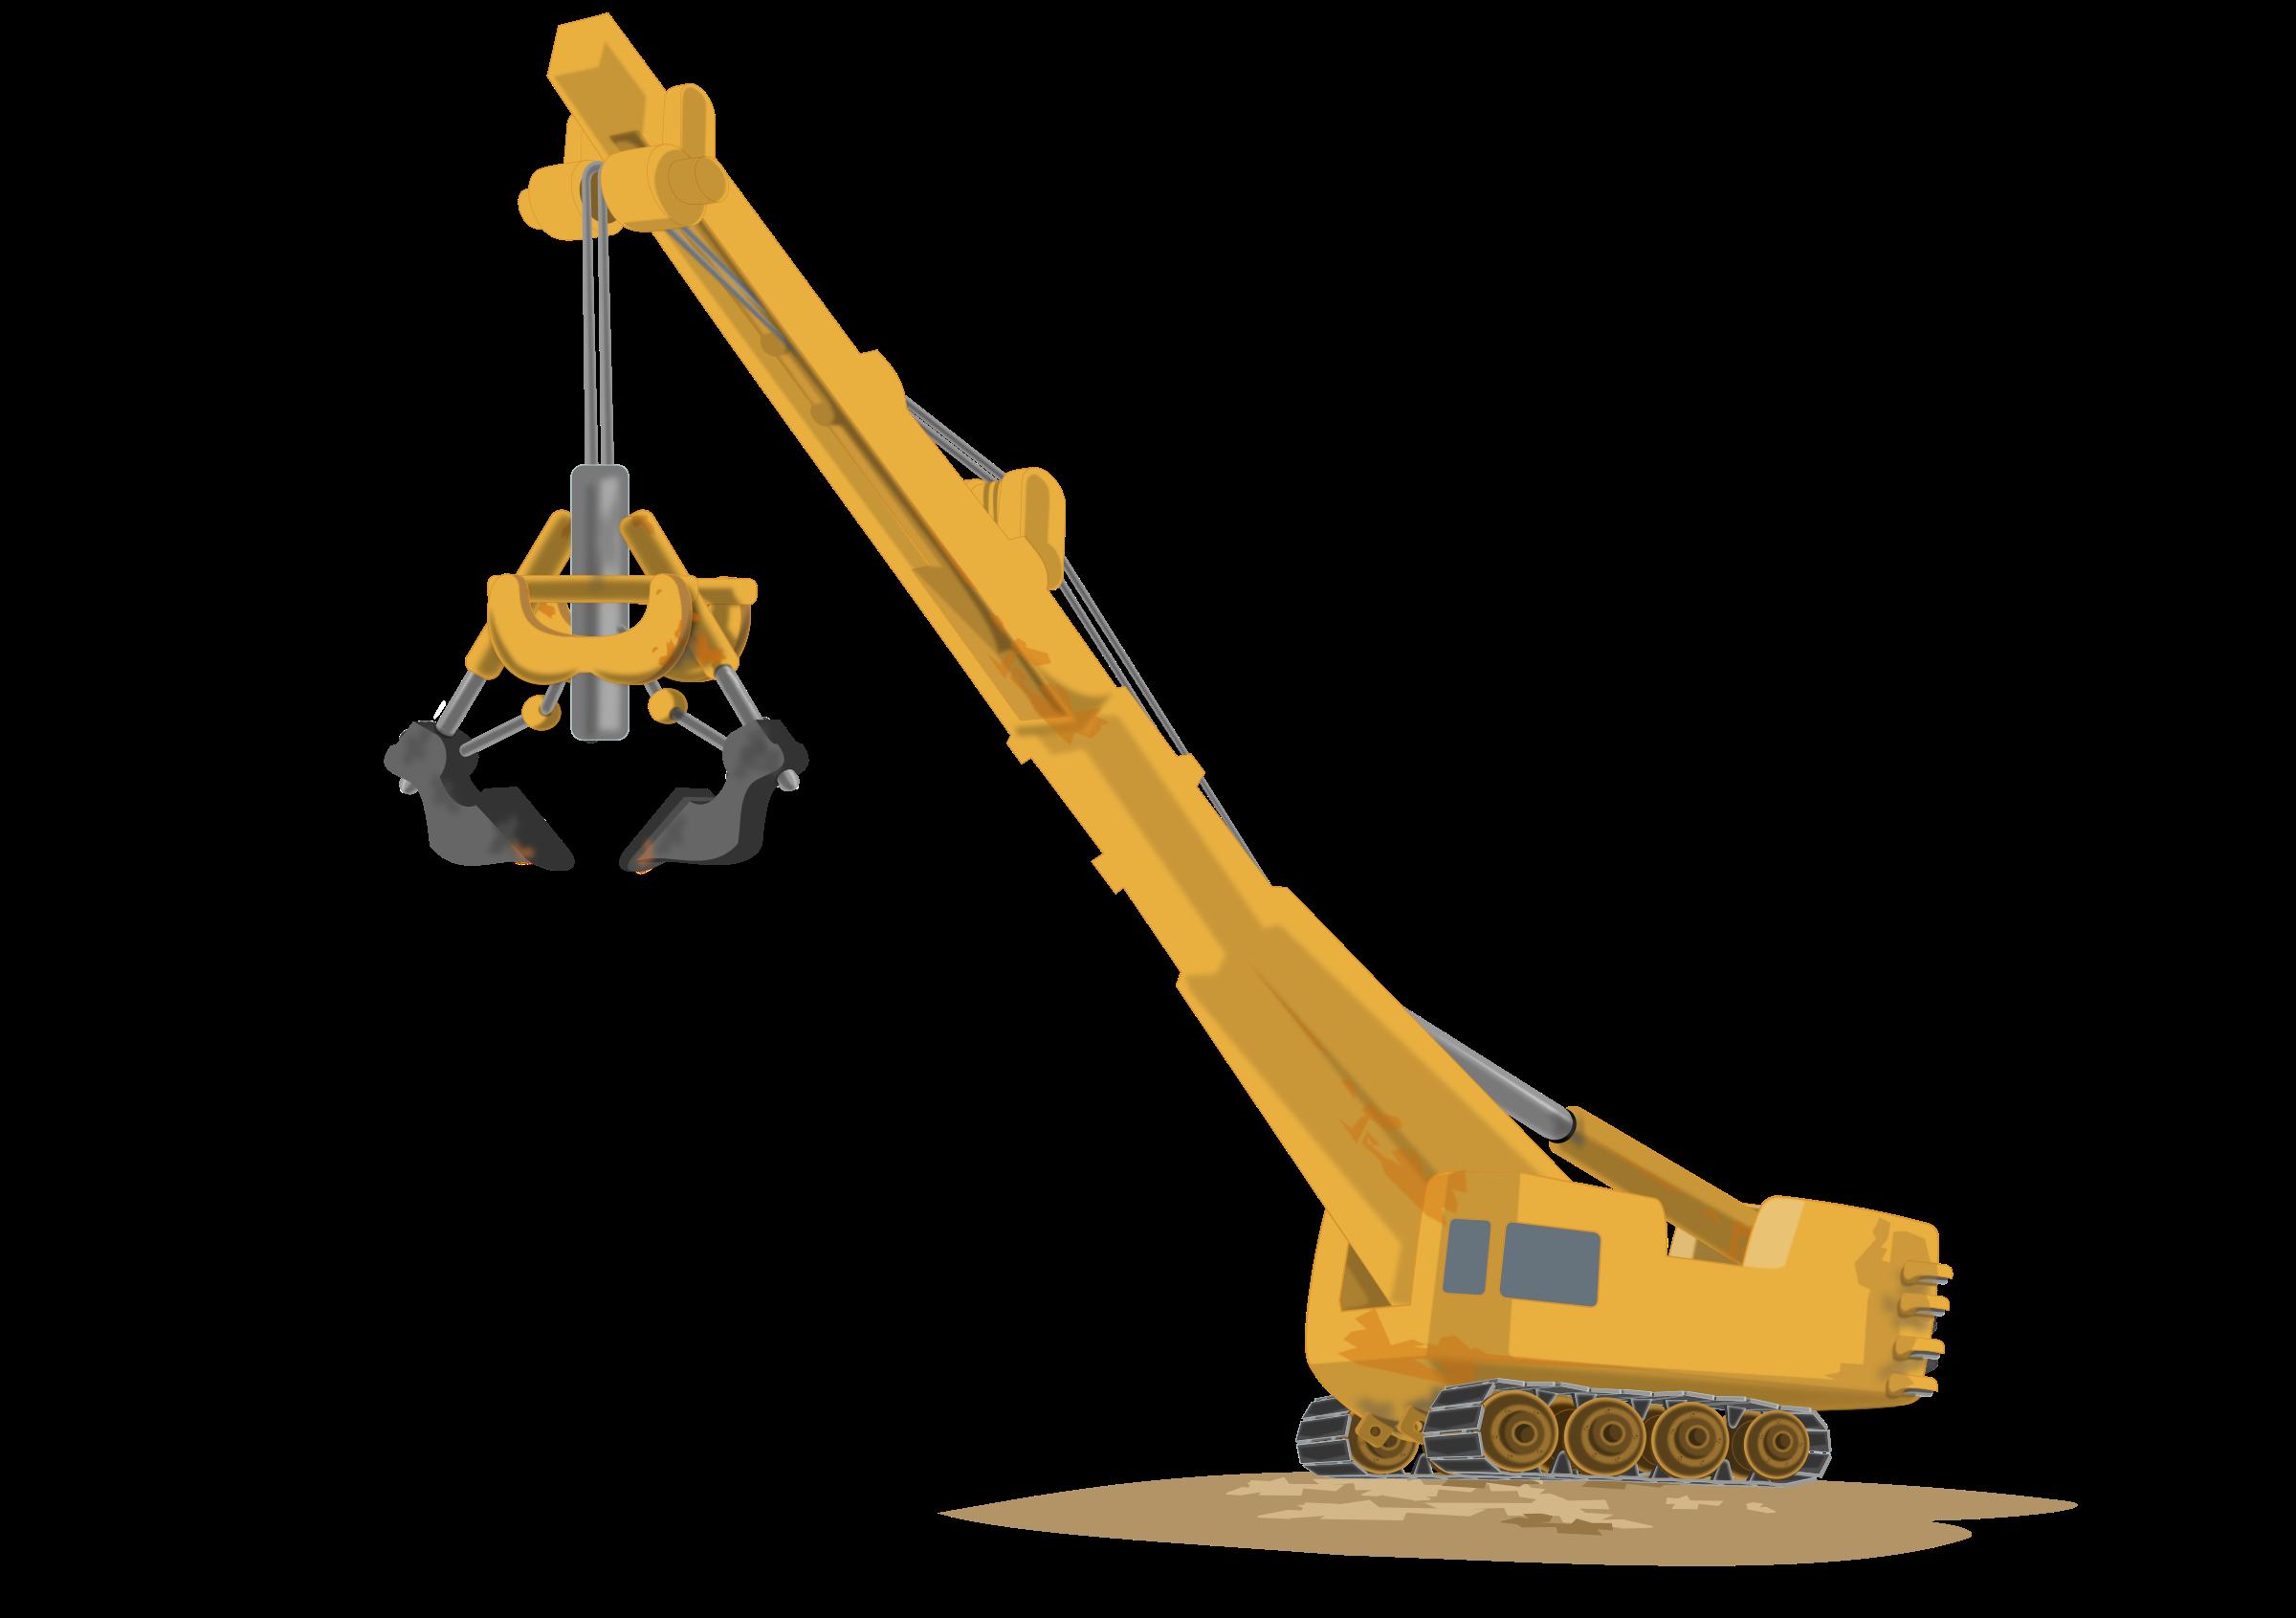 Crane clipart transparent background. Png images free download